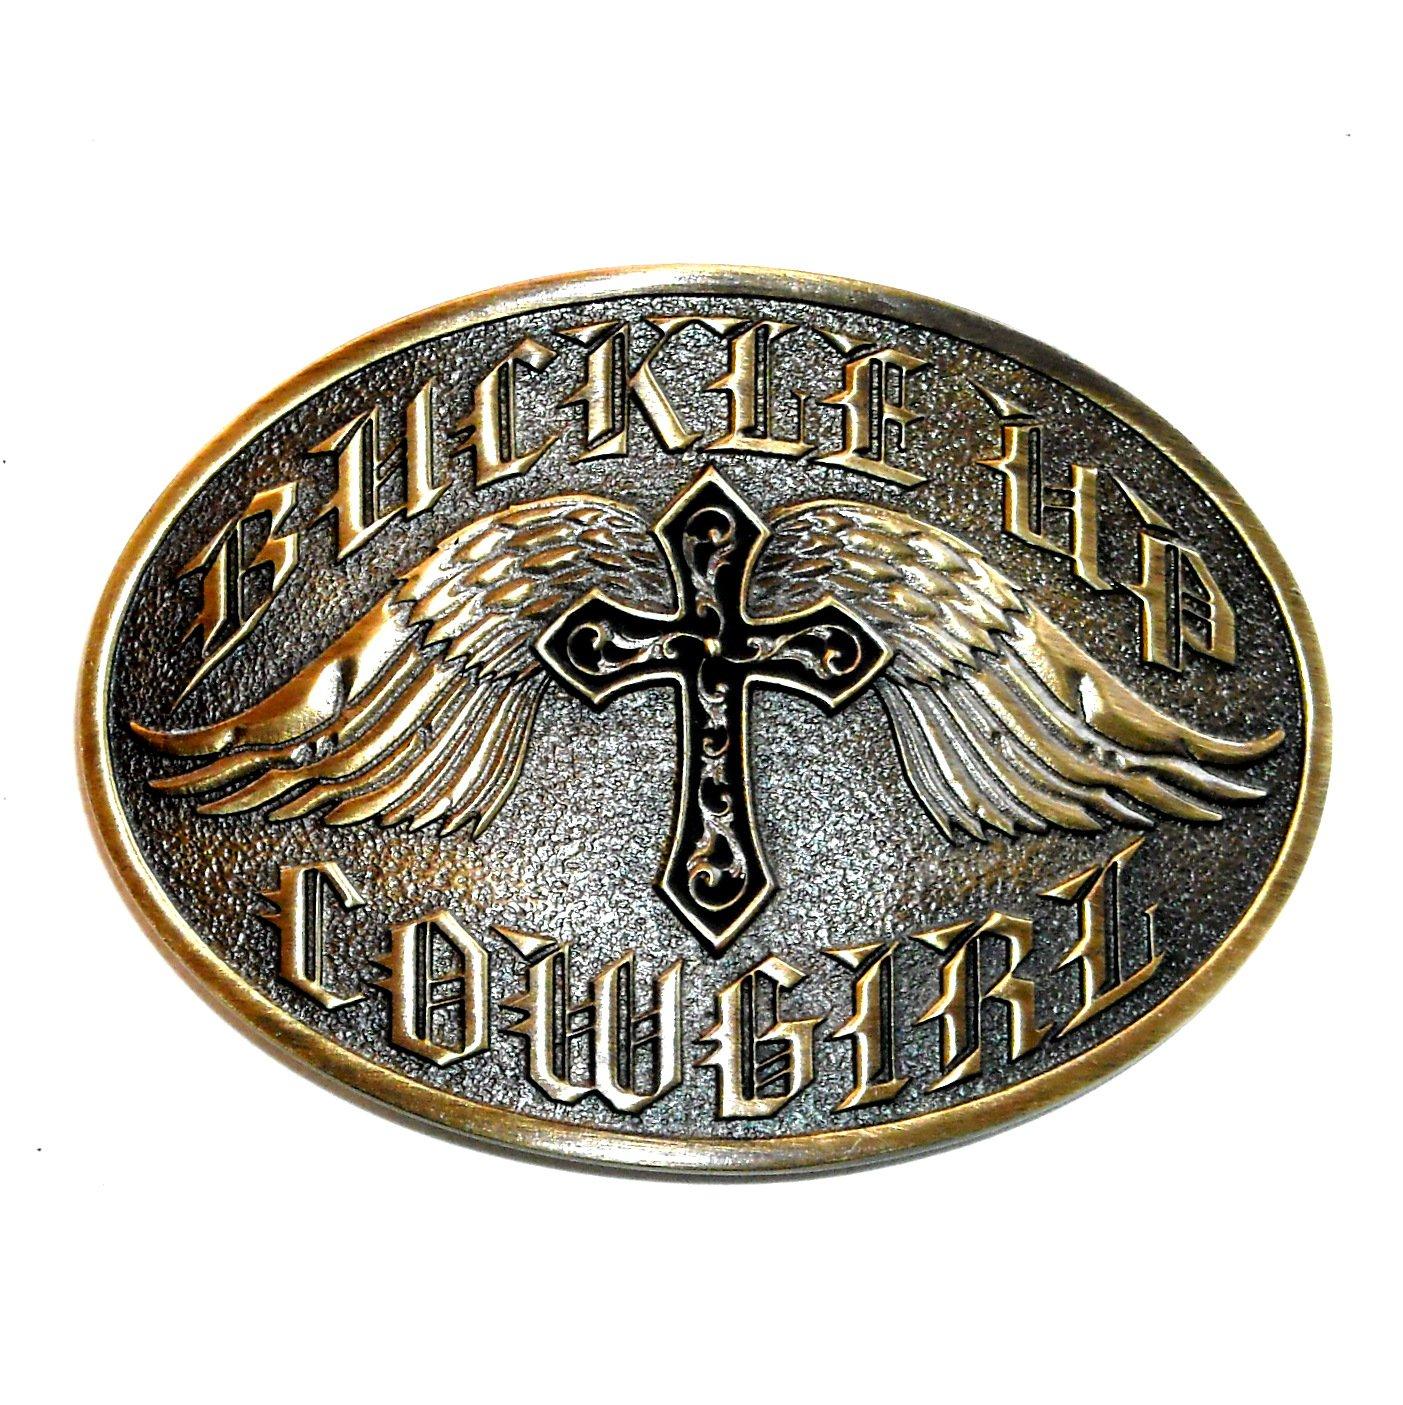 Cowgirl Buckle Up Cross Angel Wings Montana Silversmiths Belt Buckle